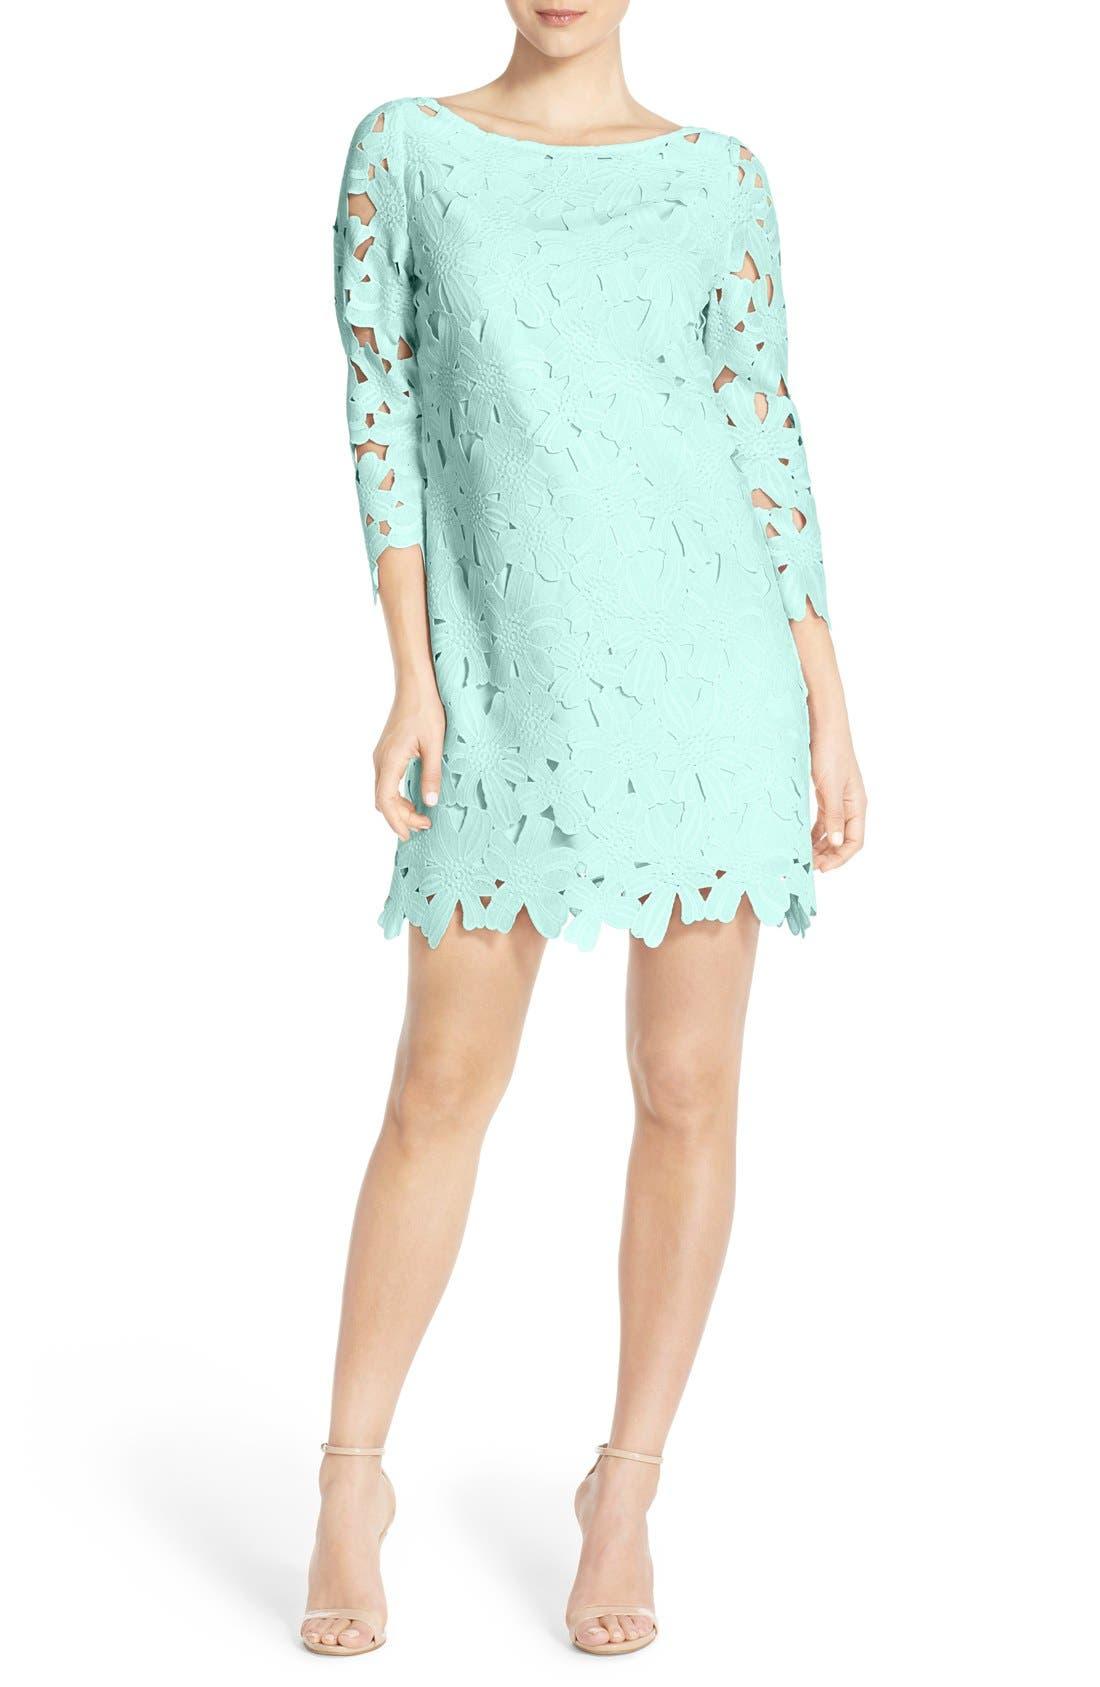 Felicity U0026 Coco Belza Floral Lace Shift Dress (Nordstrom Exclusive)